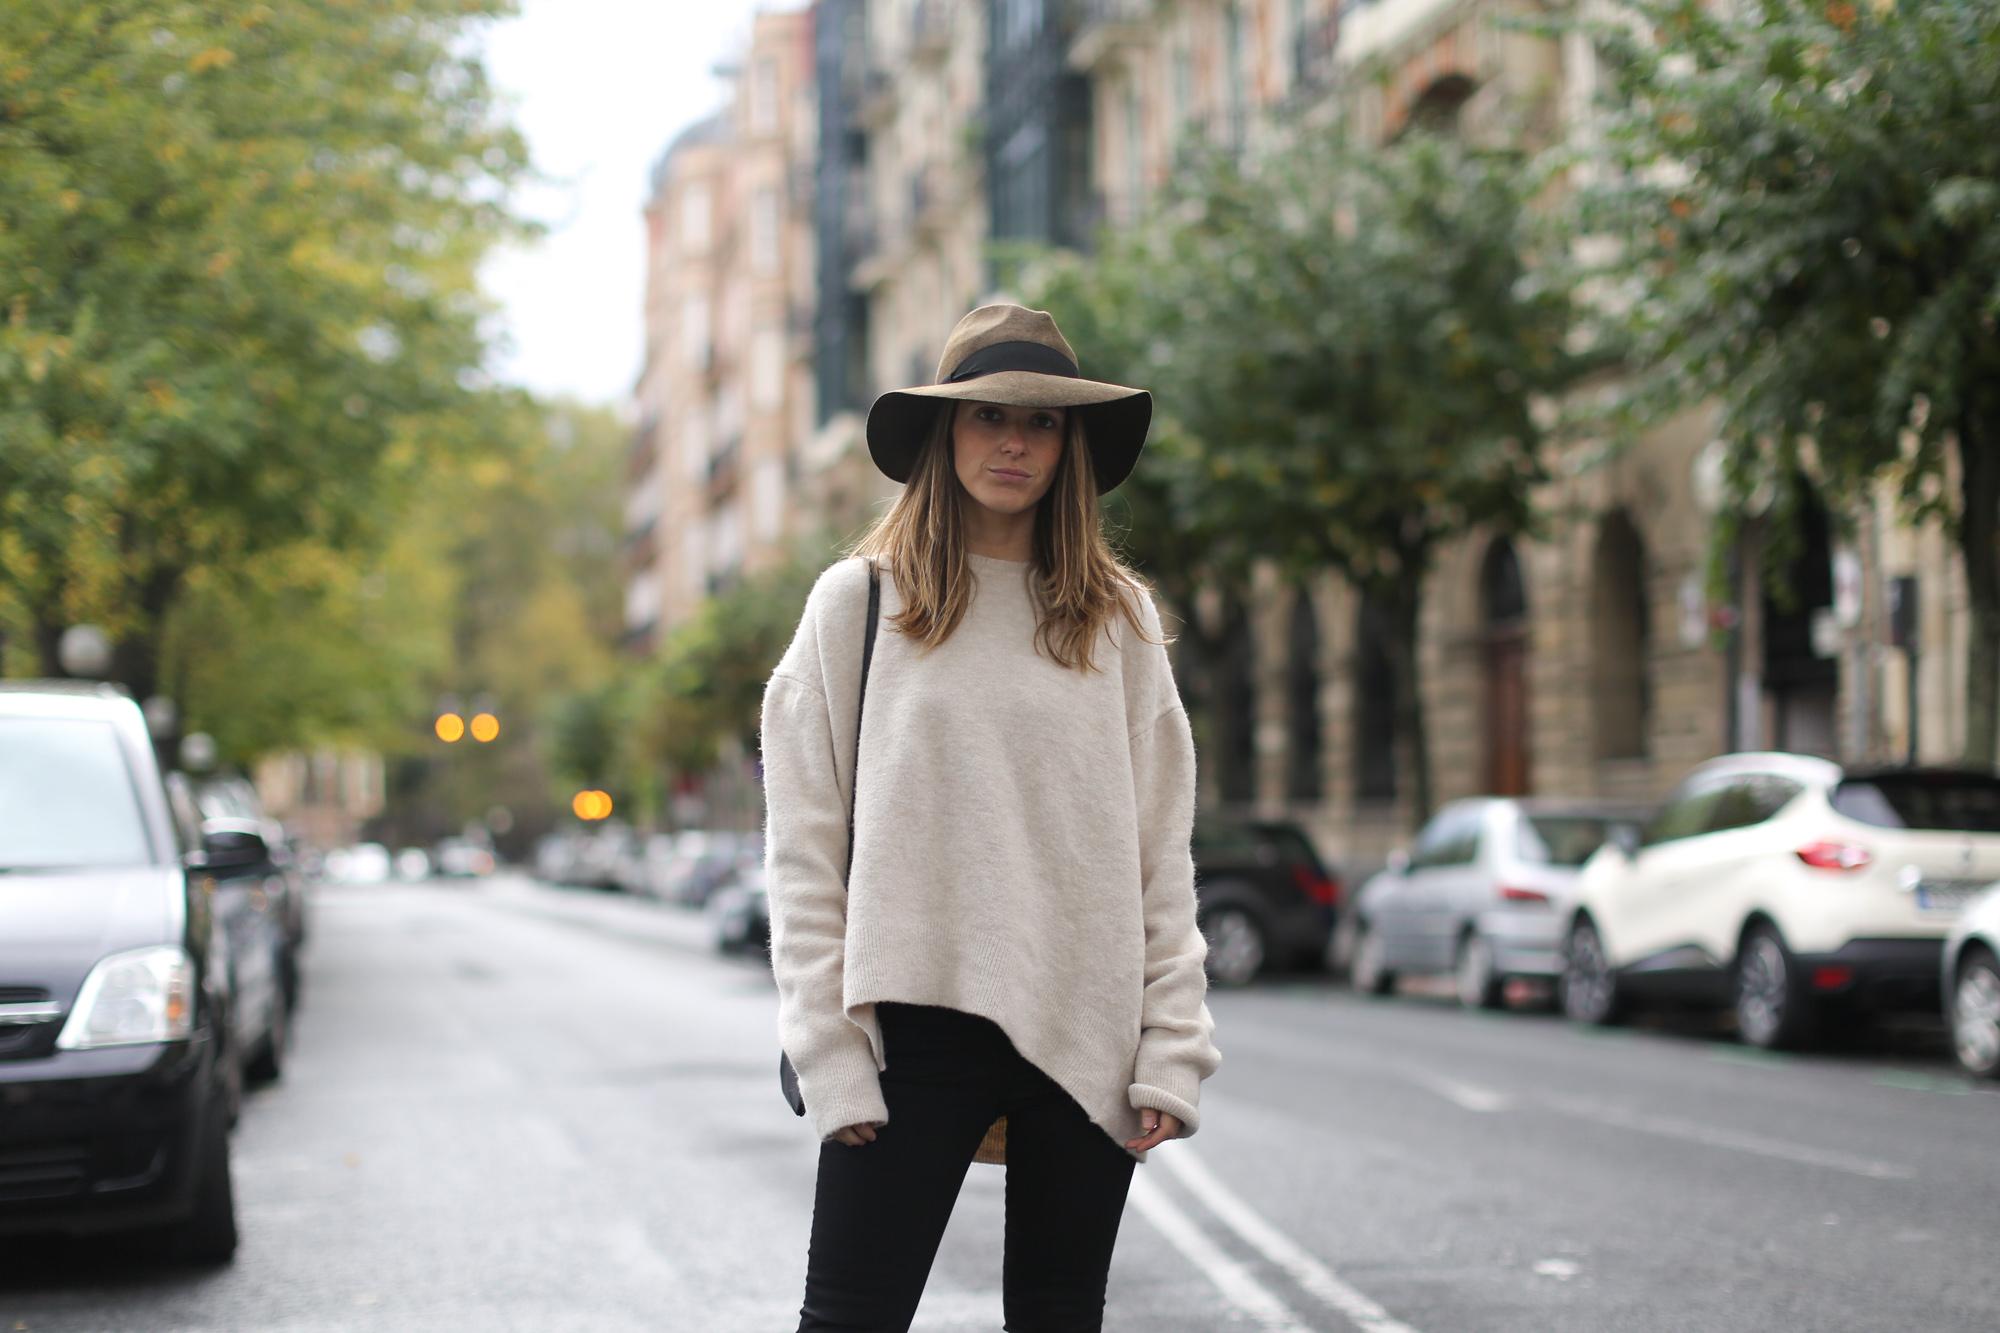 Clochet-streetstyle-celine-trio-bag-zara-oversized-knit-fedora-hat-4